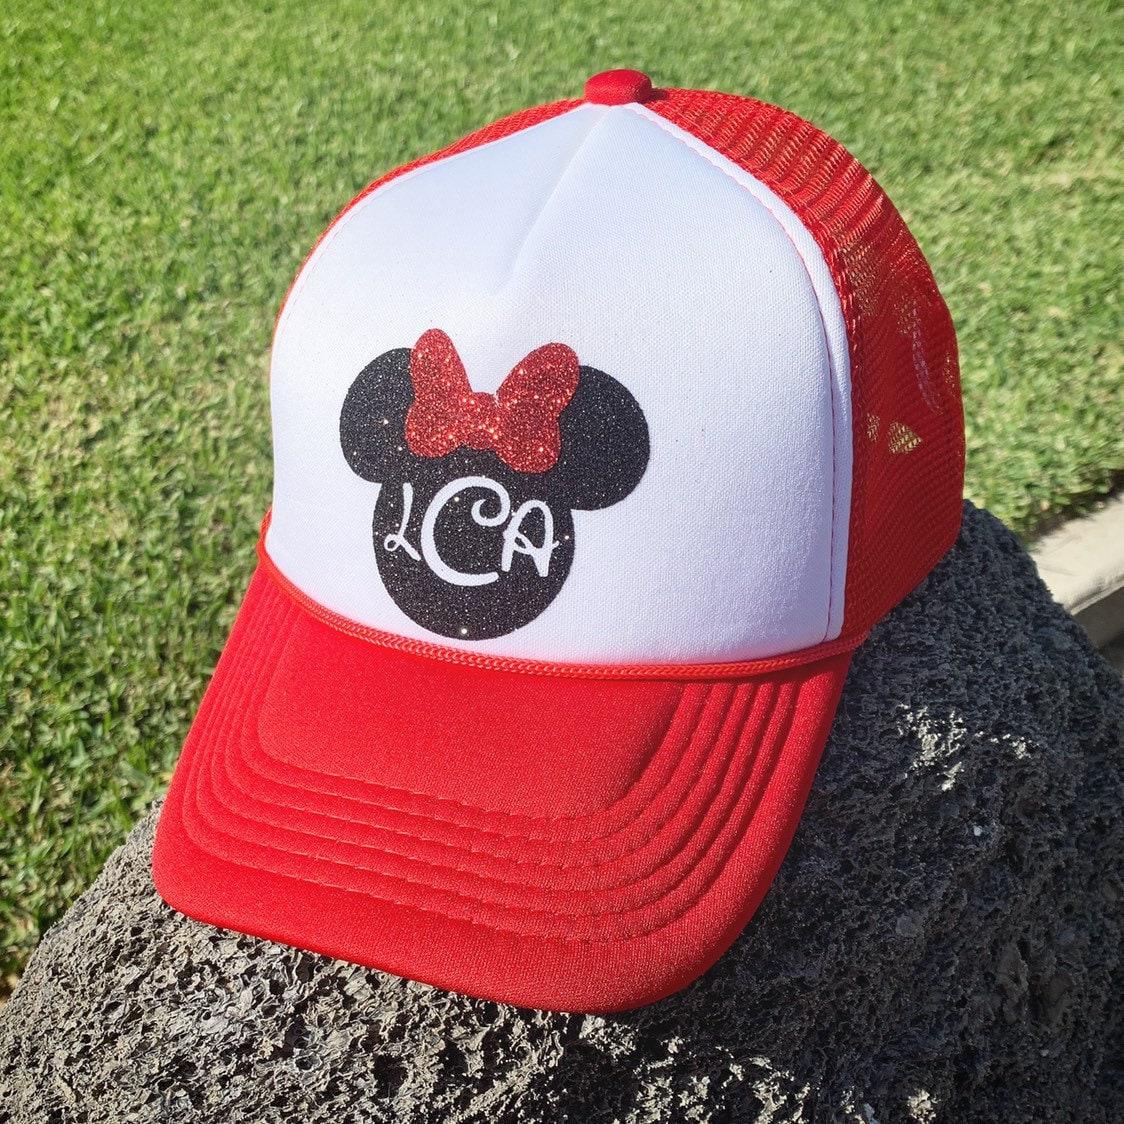 afb2dbc054509 Minnie Mouse monogram Trucker Hat women glitter baseball cap disney mom  disneyland park minnie mickey disney world vacation gift birthday